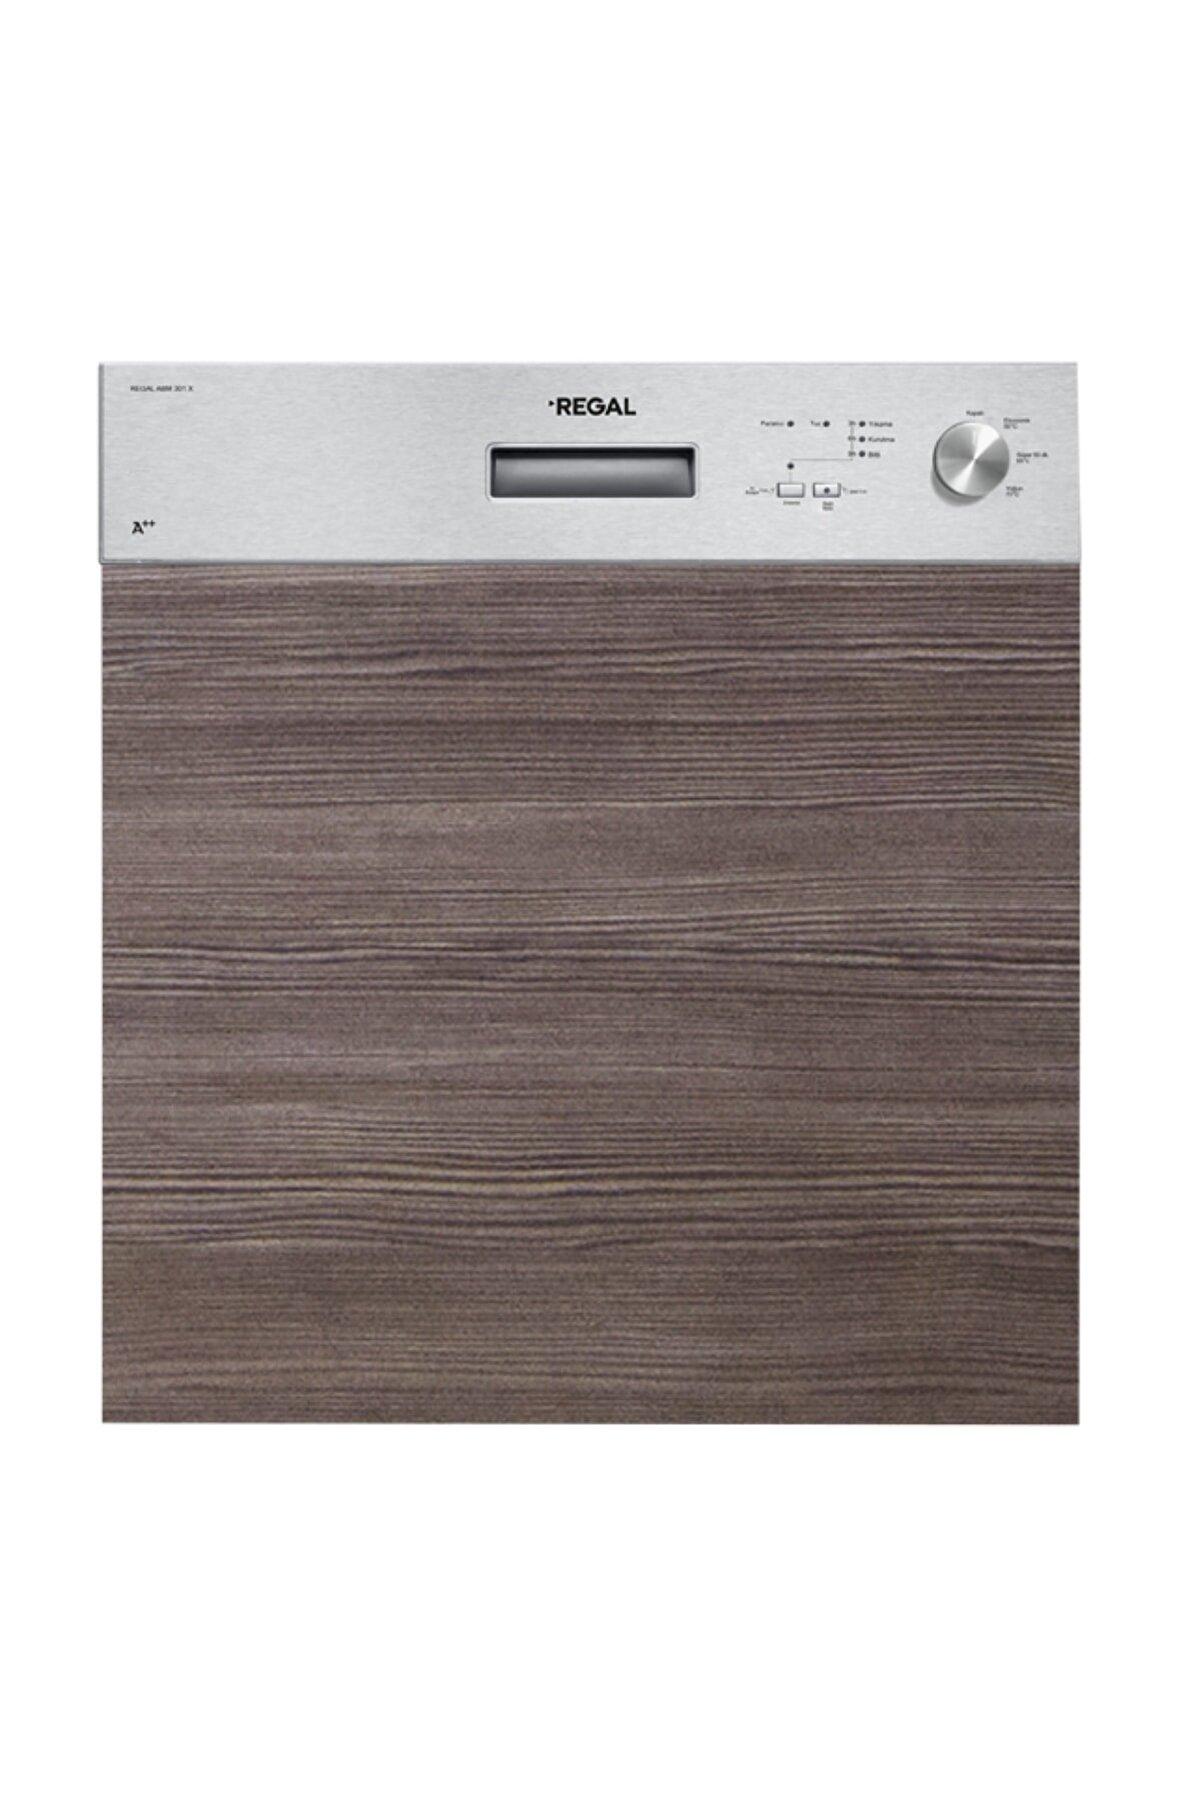 Regal ABM 301 X A++ 3 Programlı Inox Ankastre Bulaşık Makinesi